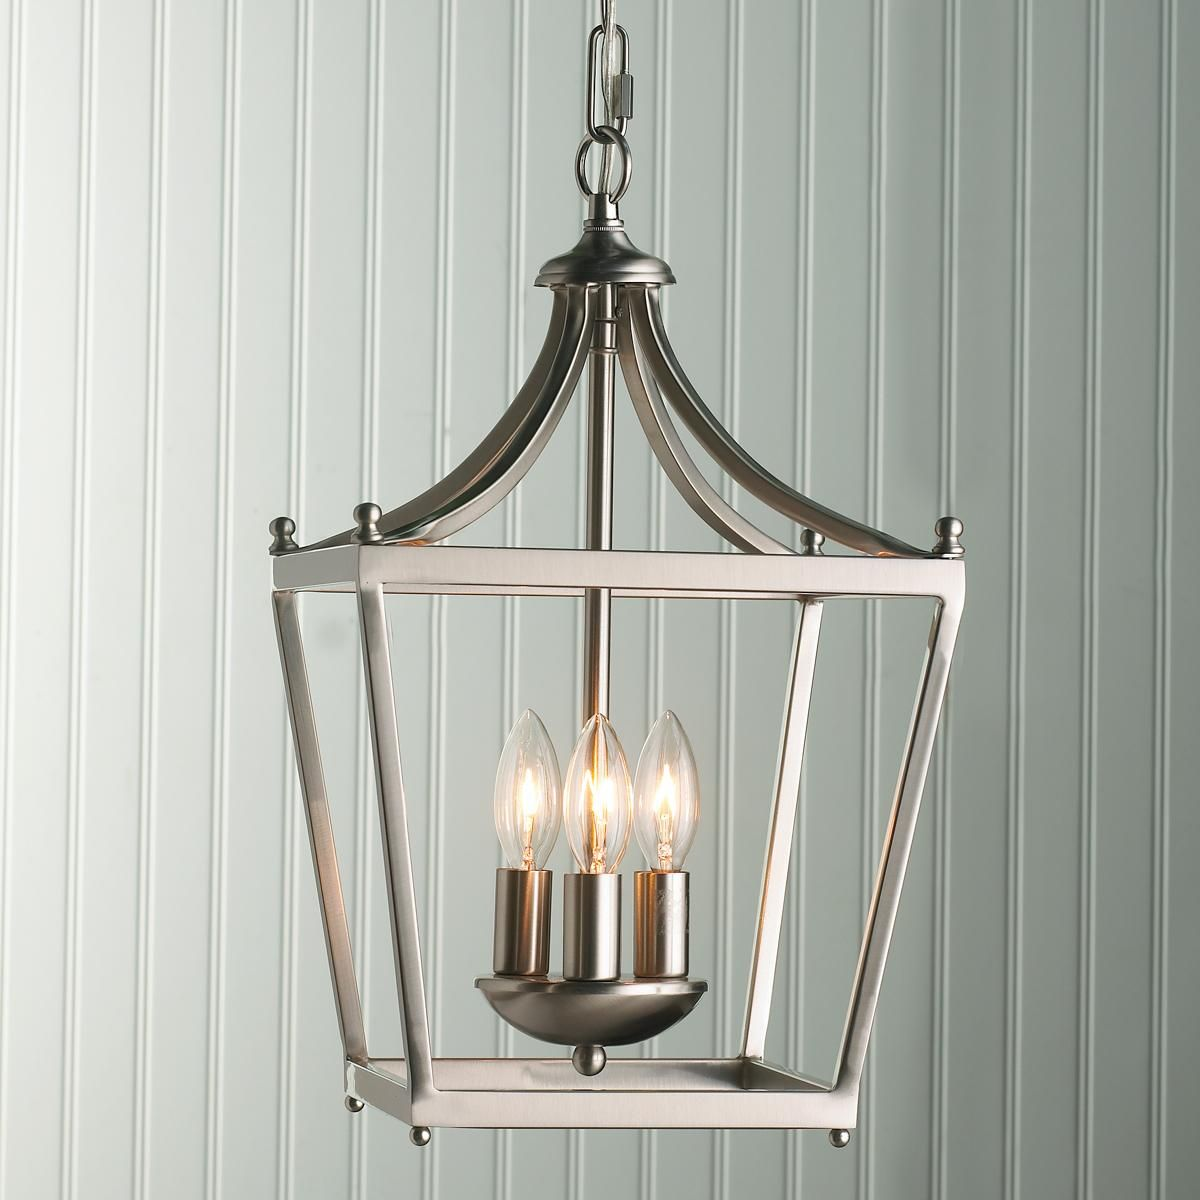 simple mini pagoda lantern light colors minis and sprays. Black Bedroom Furniture Sets. Home Design Ideas